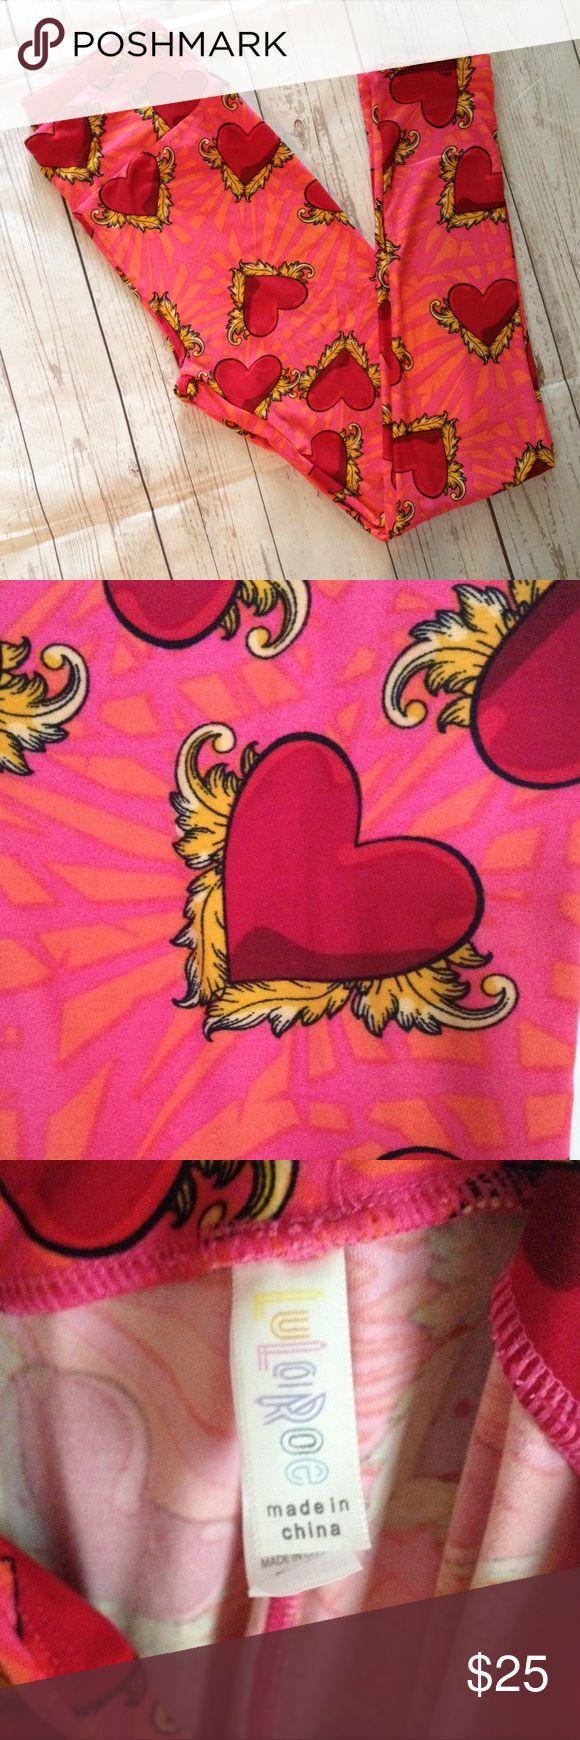 BNWT LuLaRoe OS Heart Leggings Pink and orange base.  Red hearts, gold accents. LuLaRoe Pants Leggings